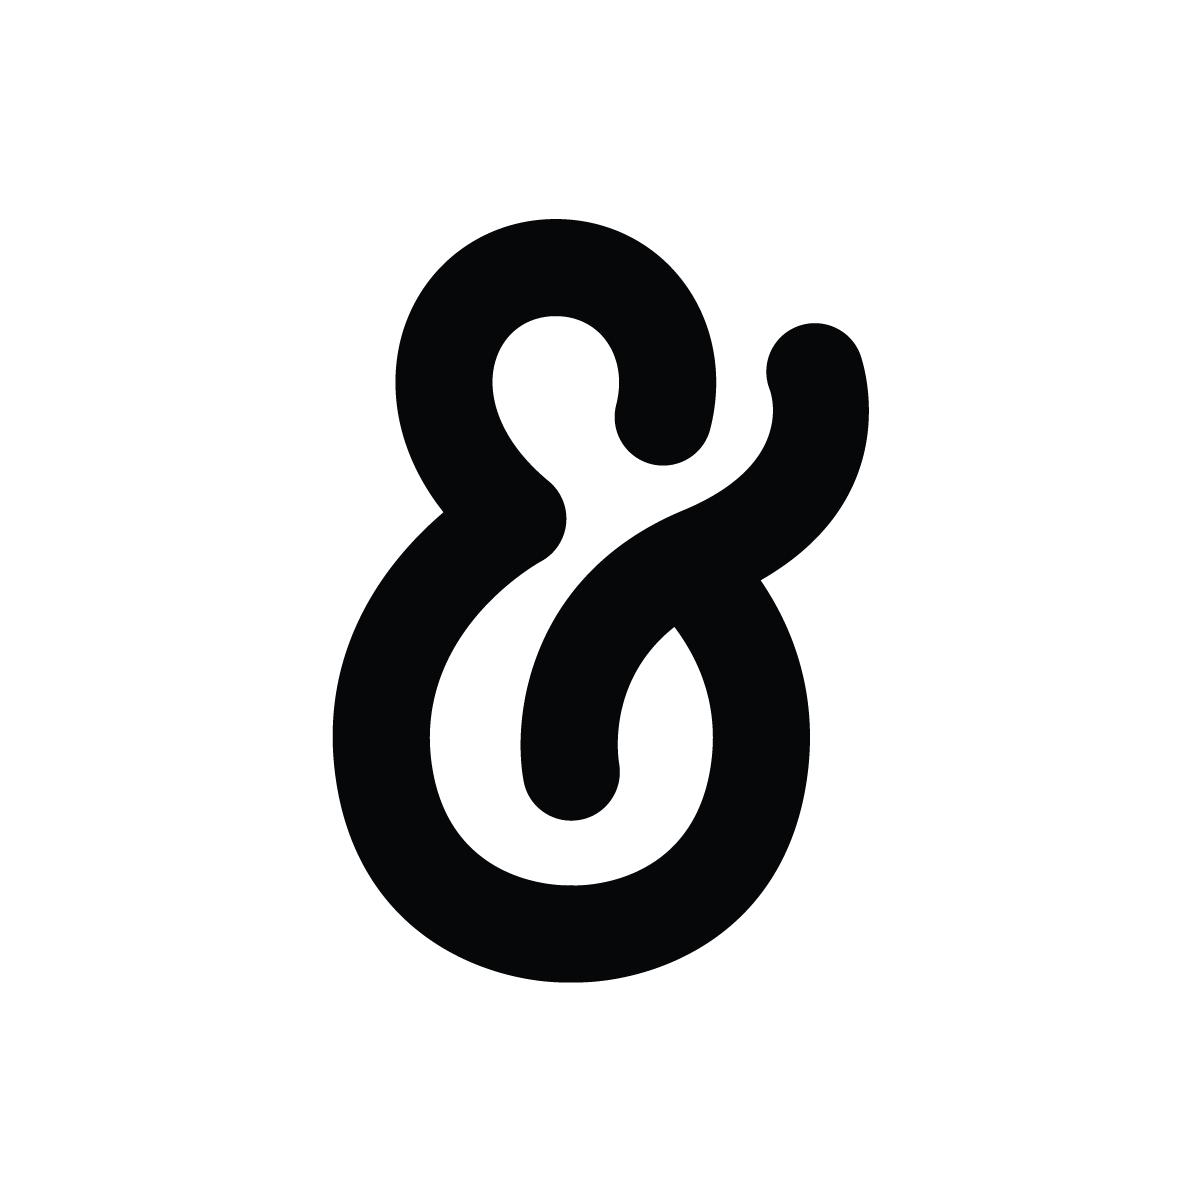 Ampersand_FNL-06.png